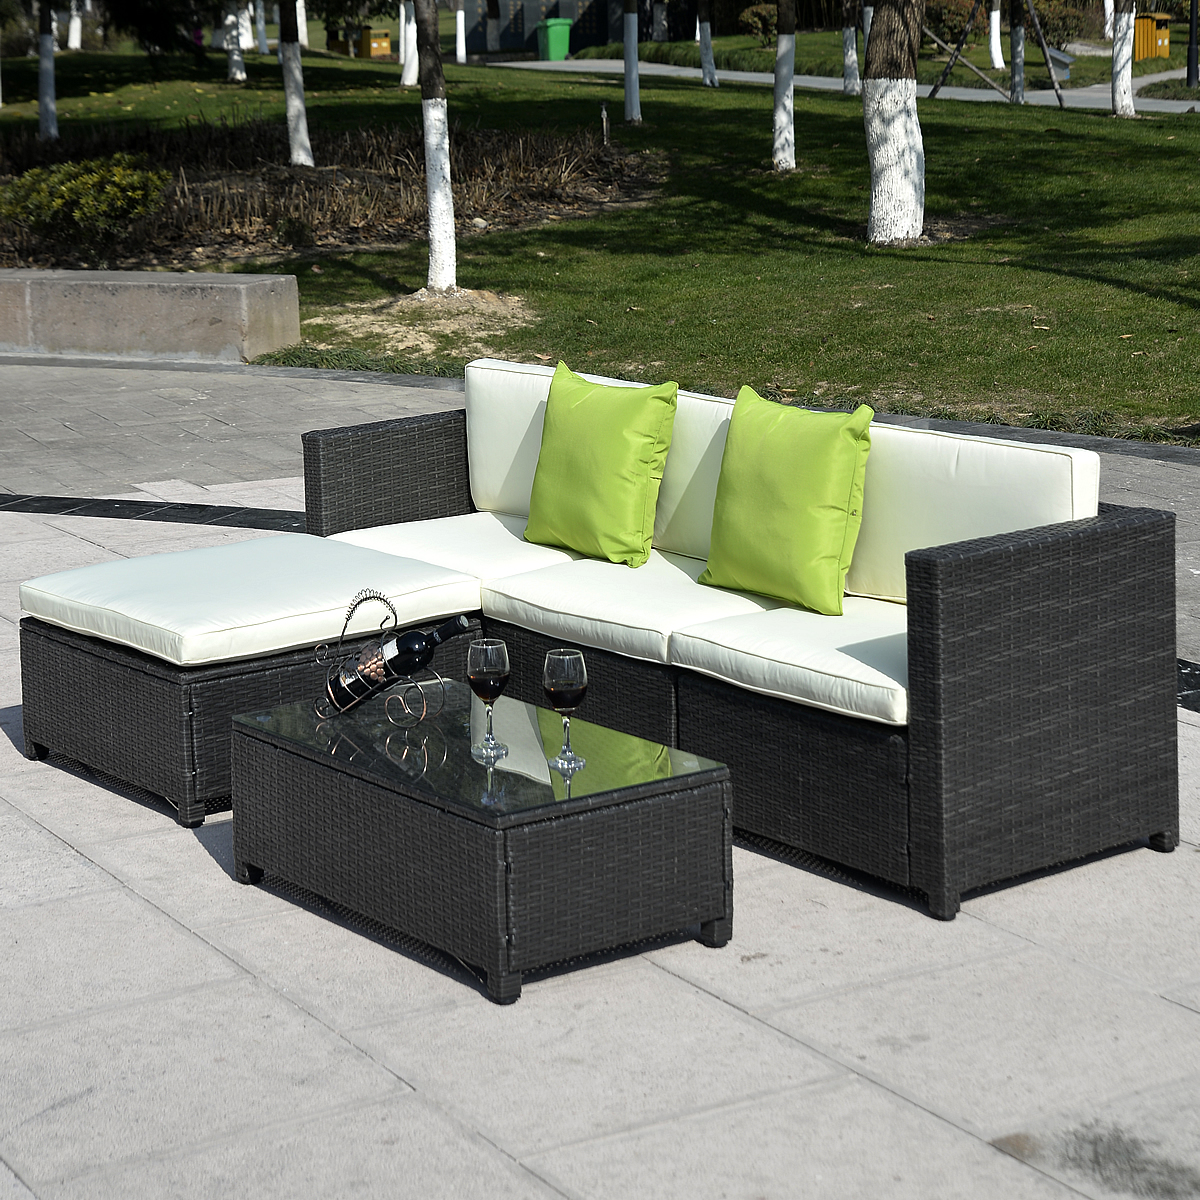 Costway Outdoor Patio 5pc Furniture Sectional Pe Wicker Rattan Sofa